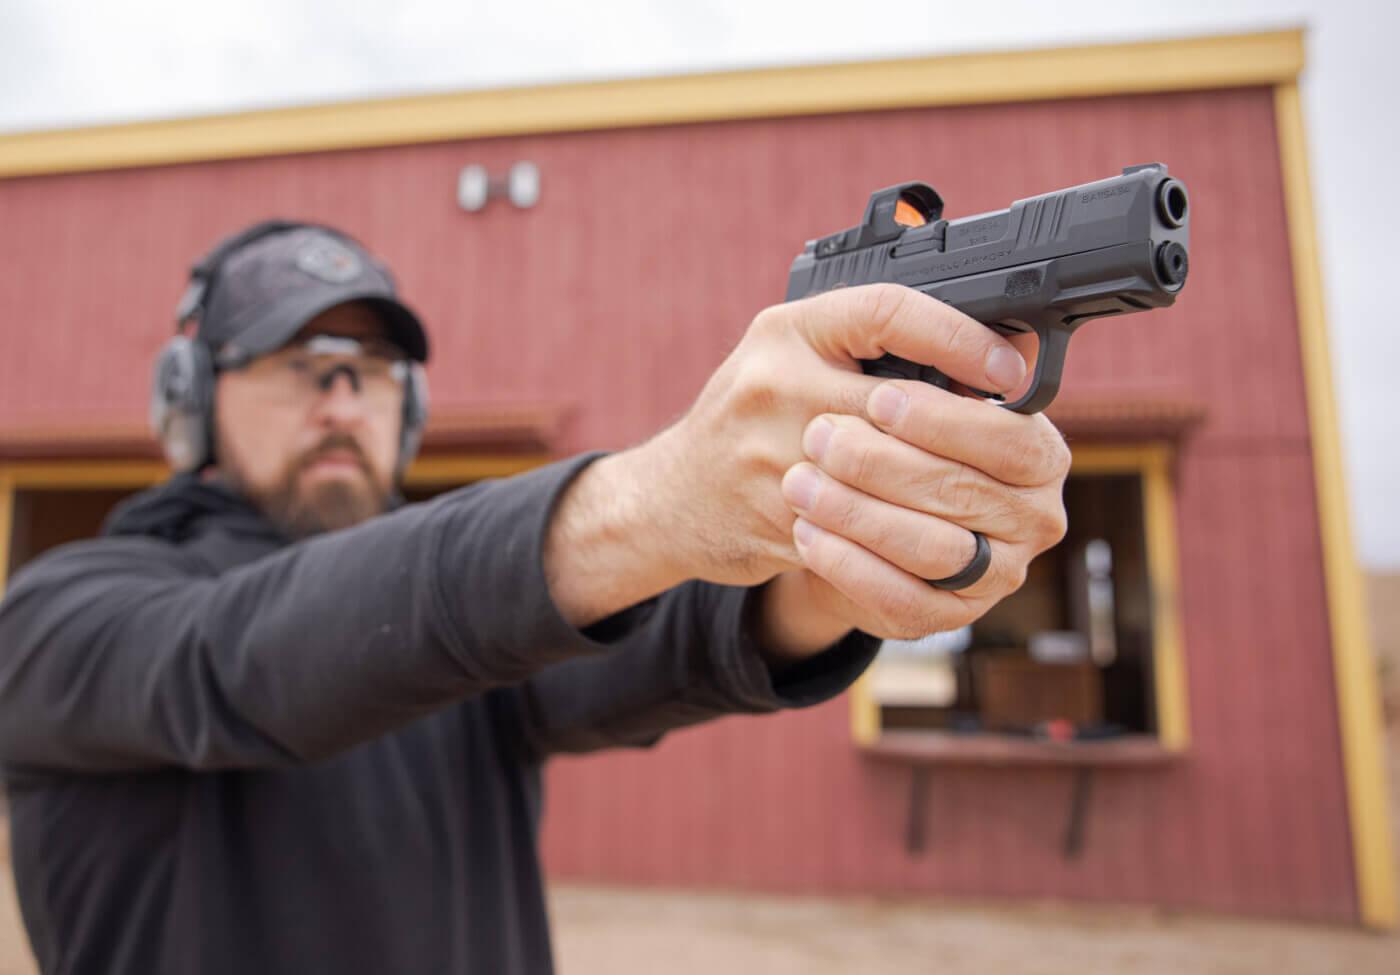 Man training with a Springfield Hellcat handgun